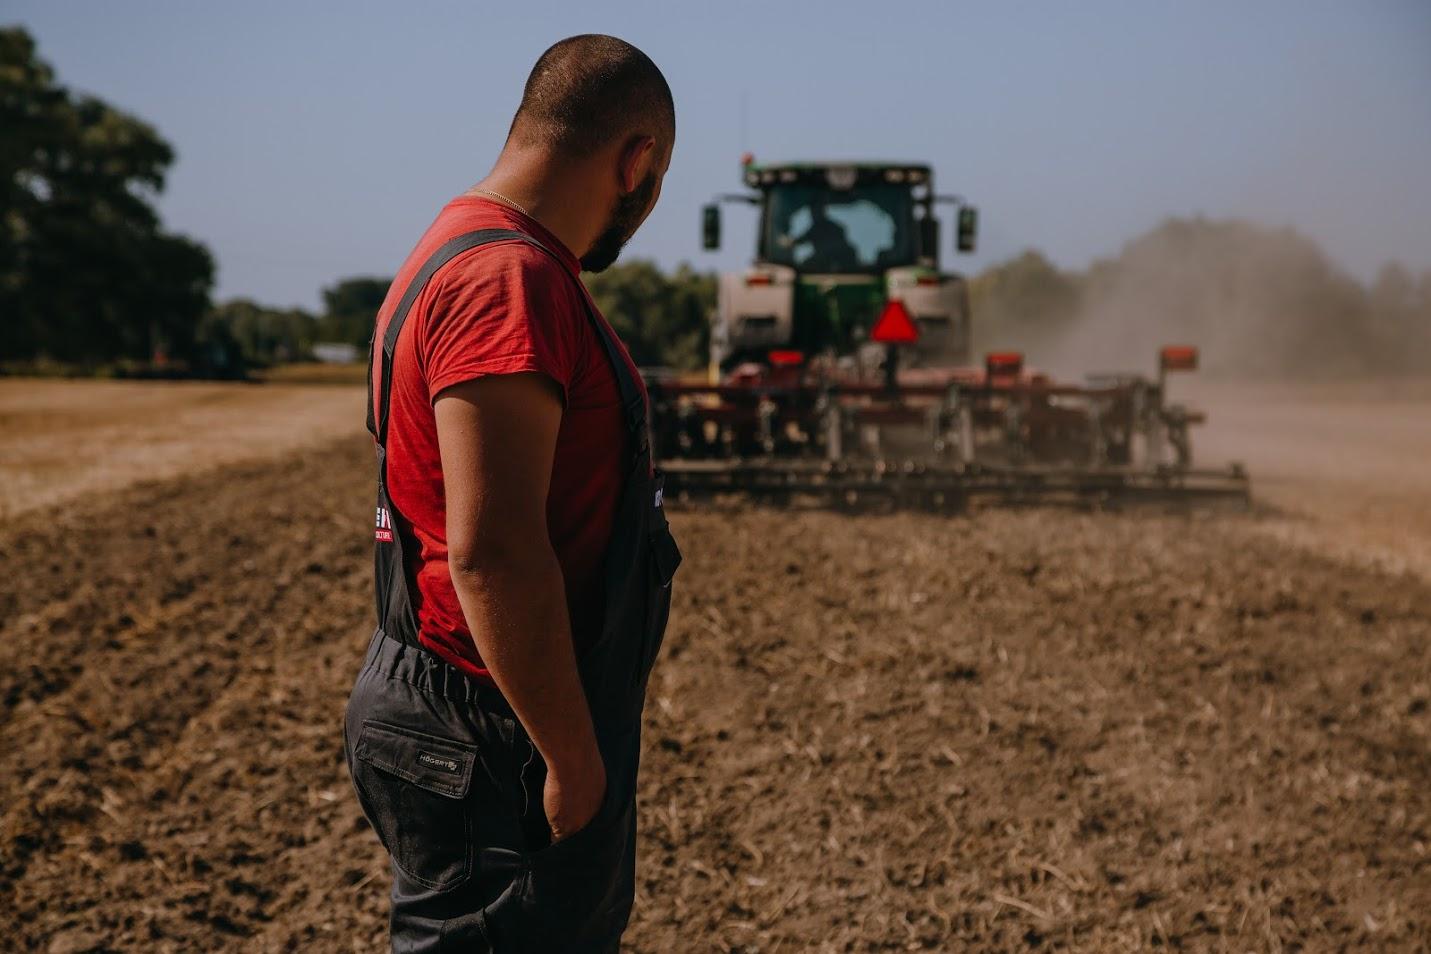 traktorist.jpg (176 KB)